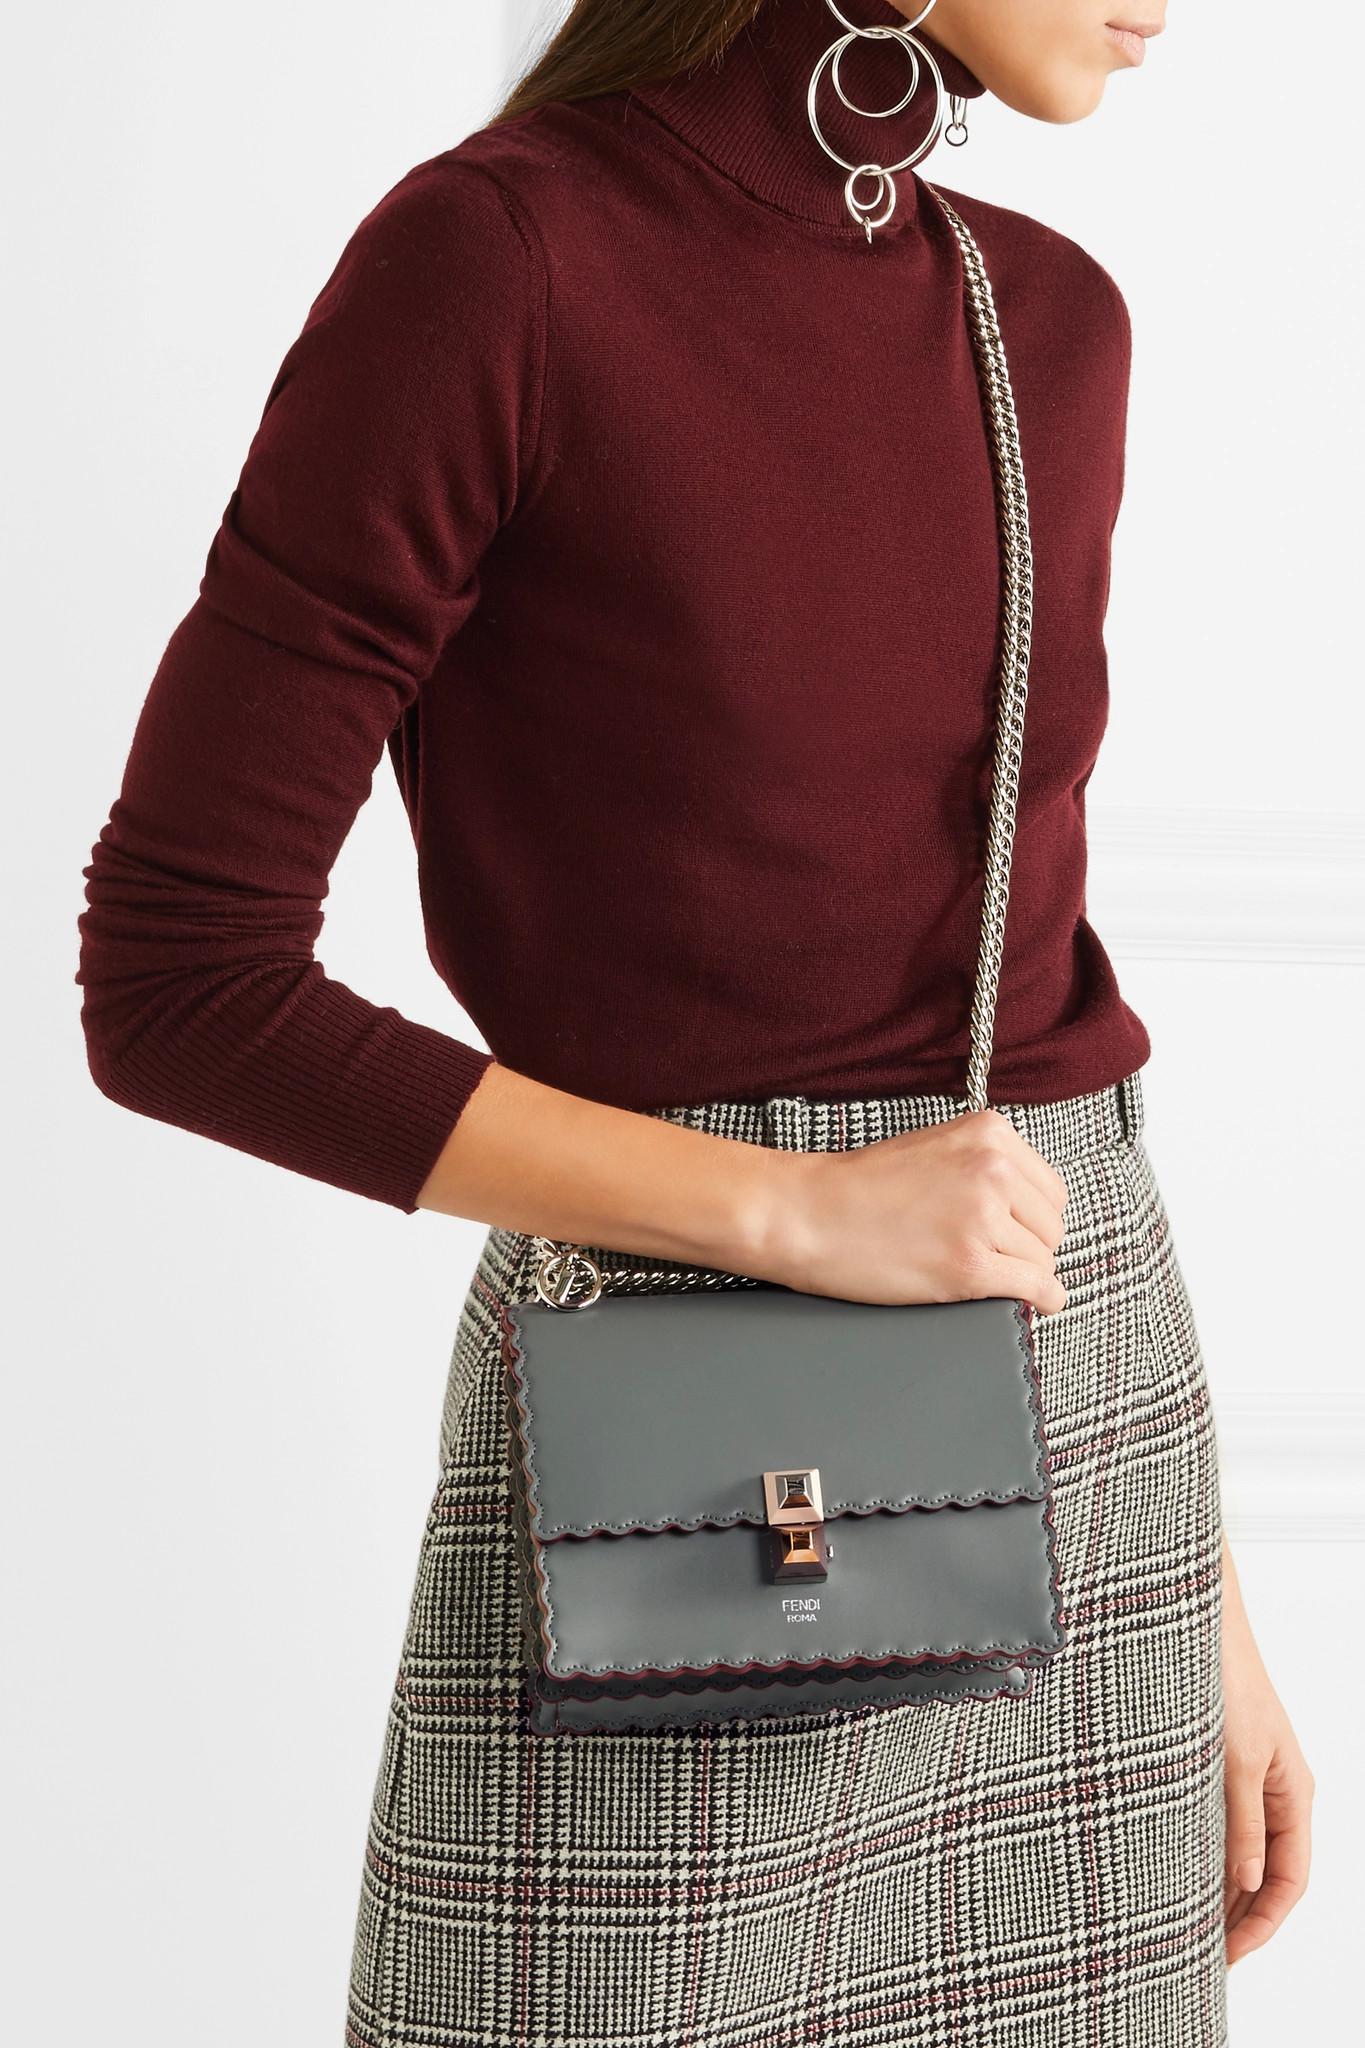 54f1edbb034a Fendi - Gray Kan I Mini Leather Shoulder Bag - Lyst. View fullscreen